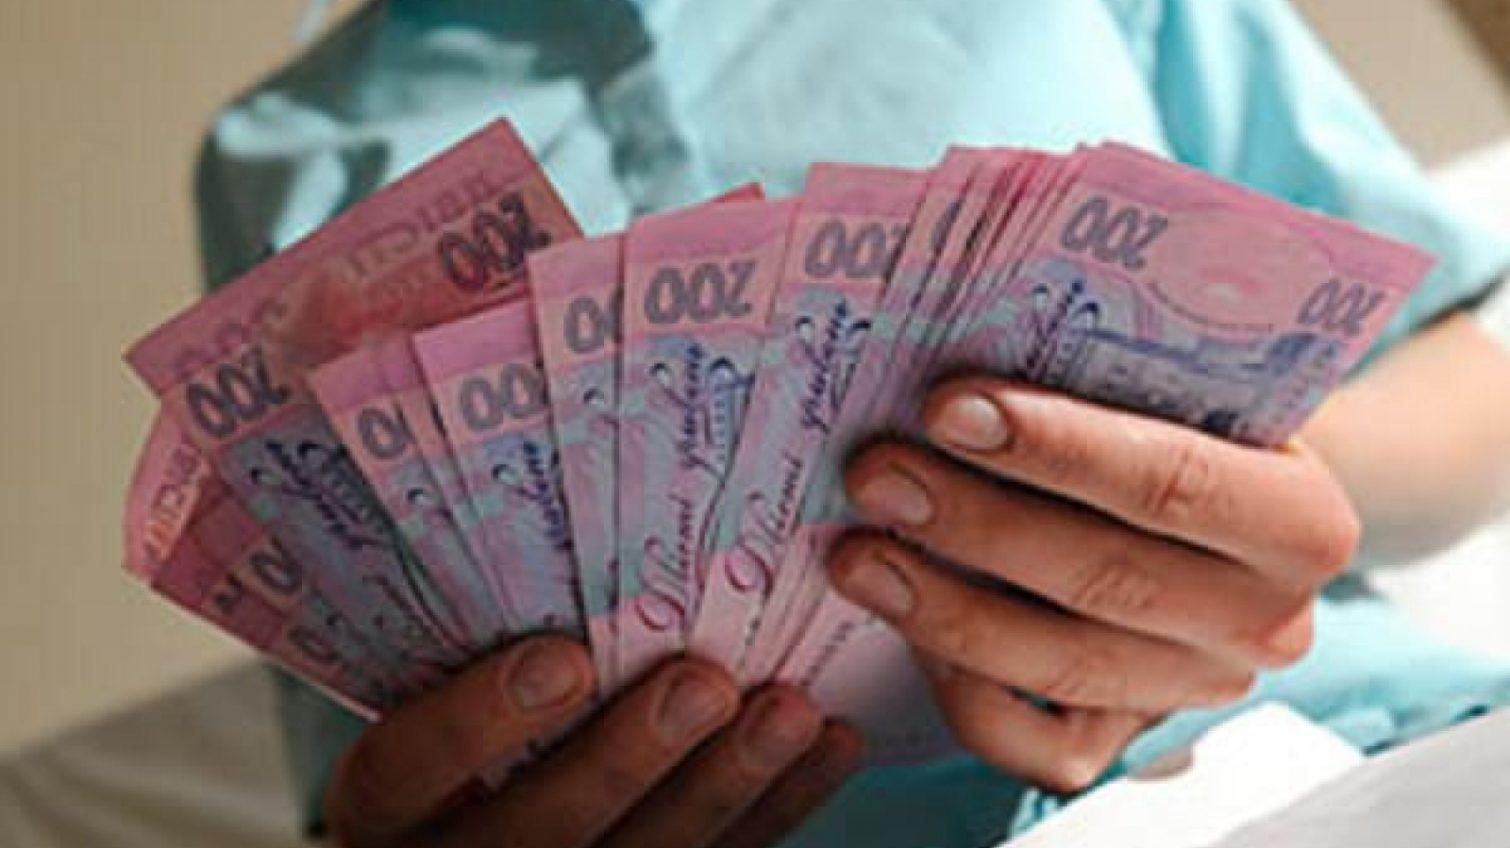 Сотрудница банка в Одесской области присвоила 2,5 миллиона гривен со счетов клиентов «фото»